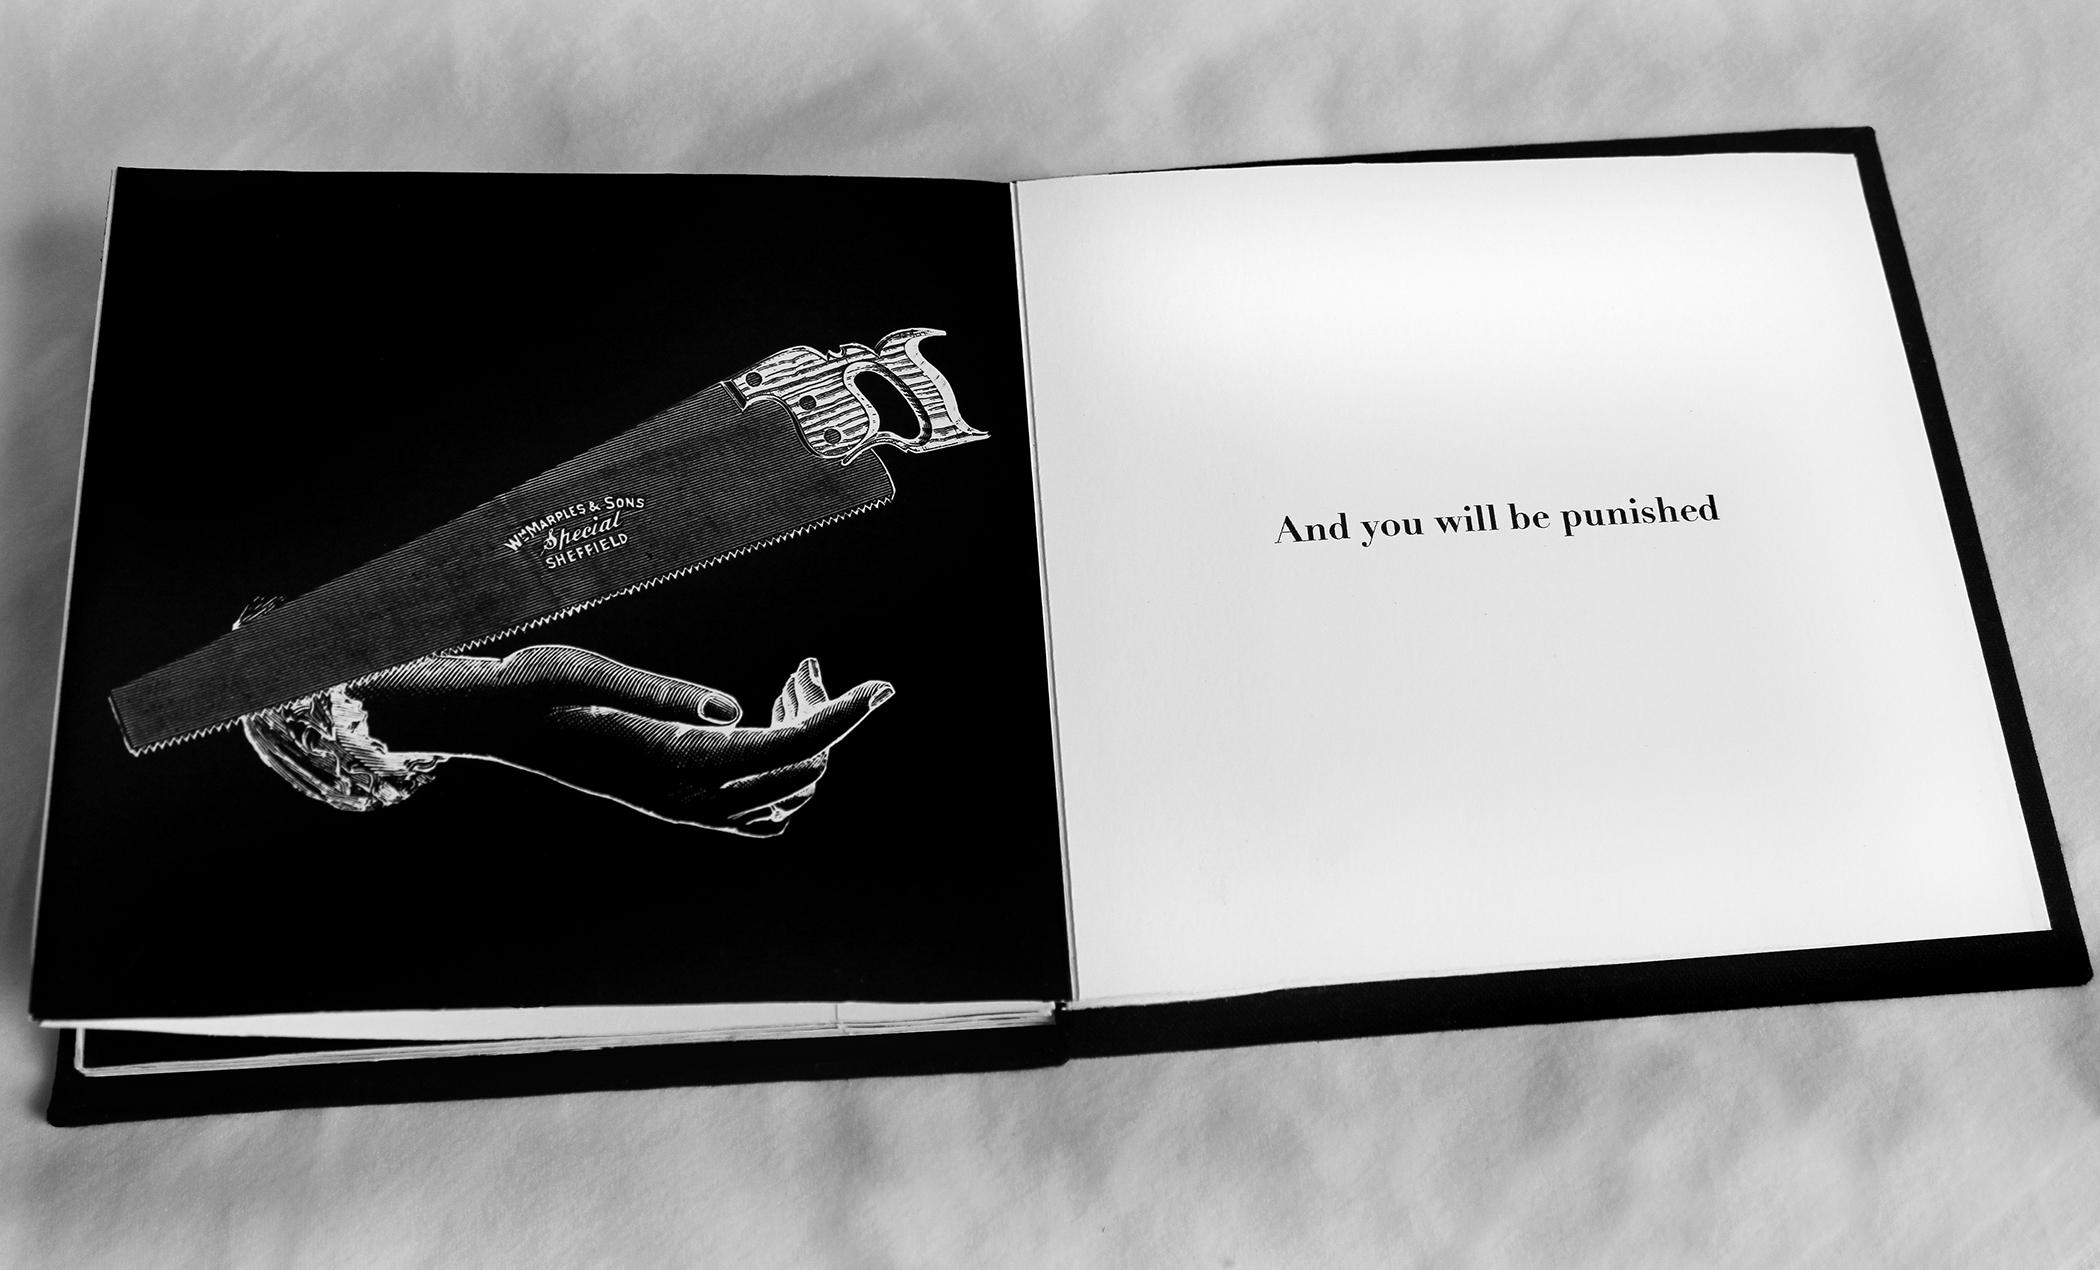 14_Last page_Bad Book.jpg